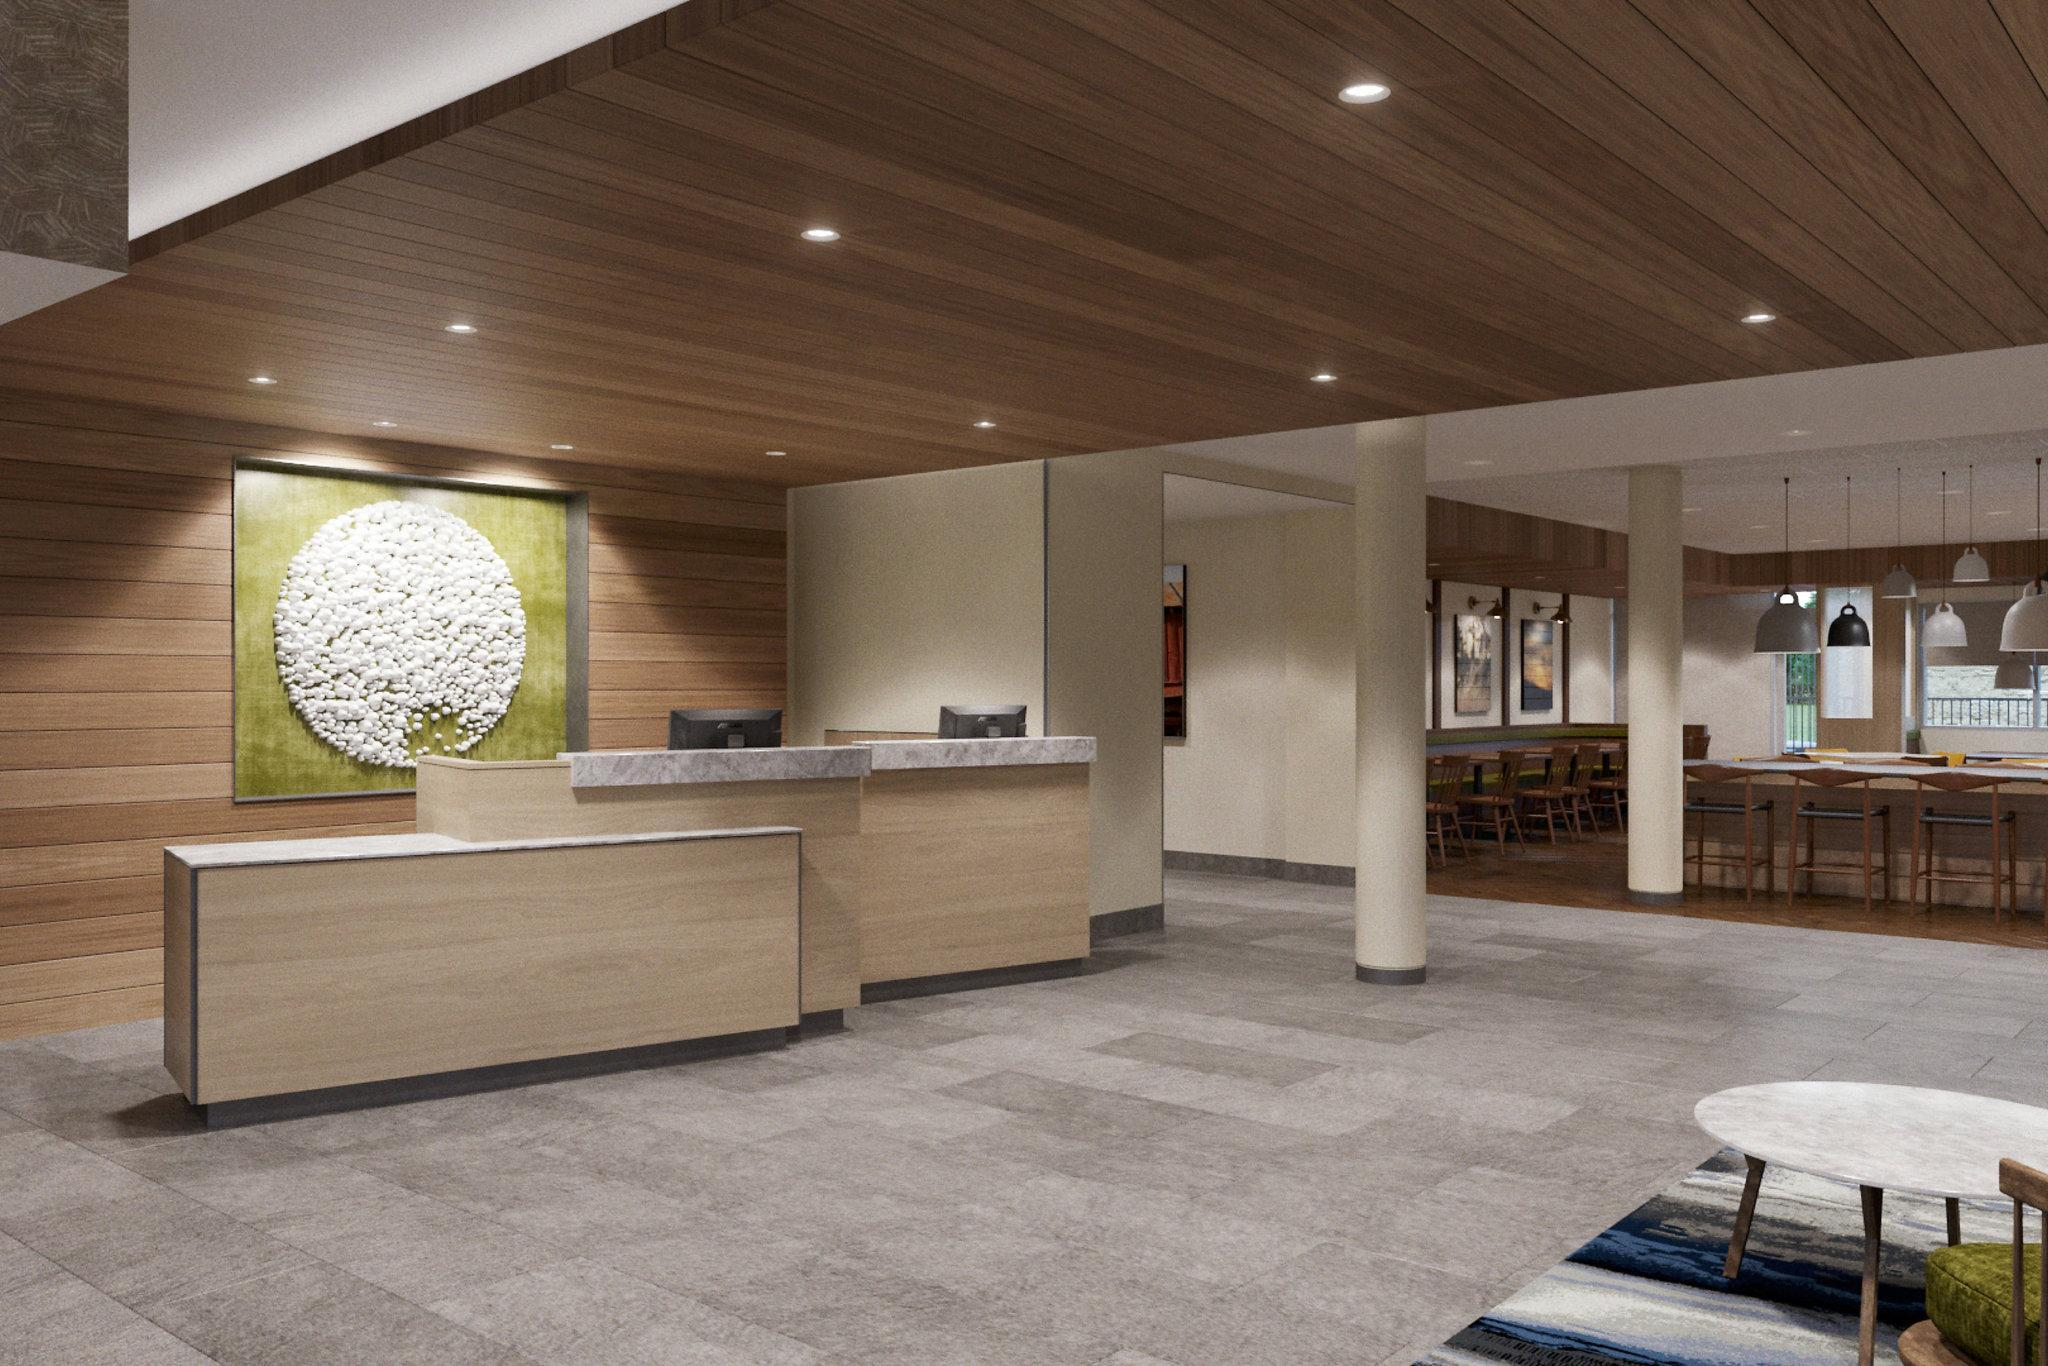 Fairfield Inn And Suites Nashville Airport